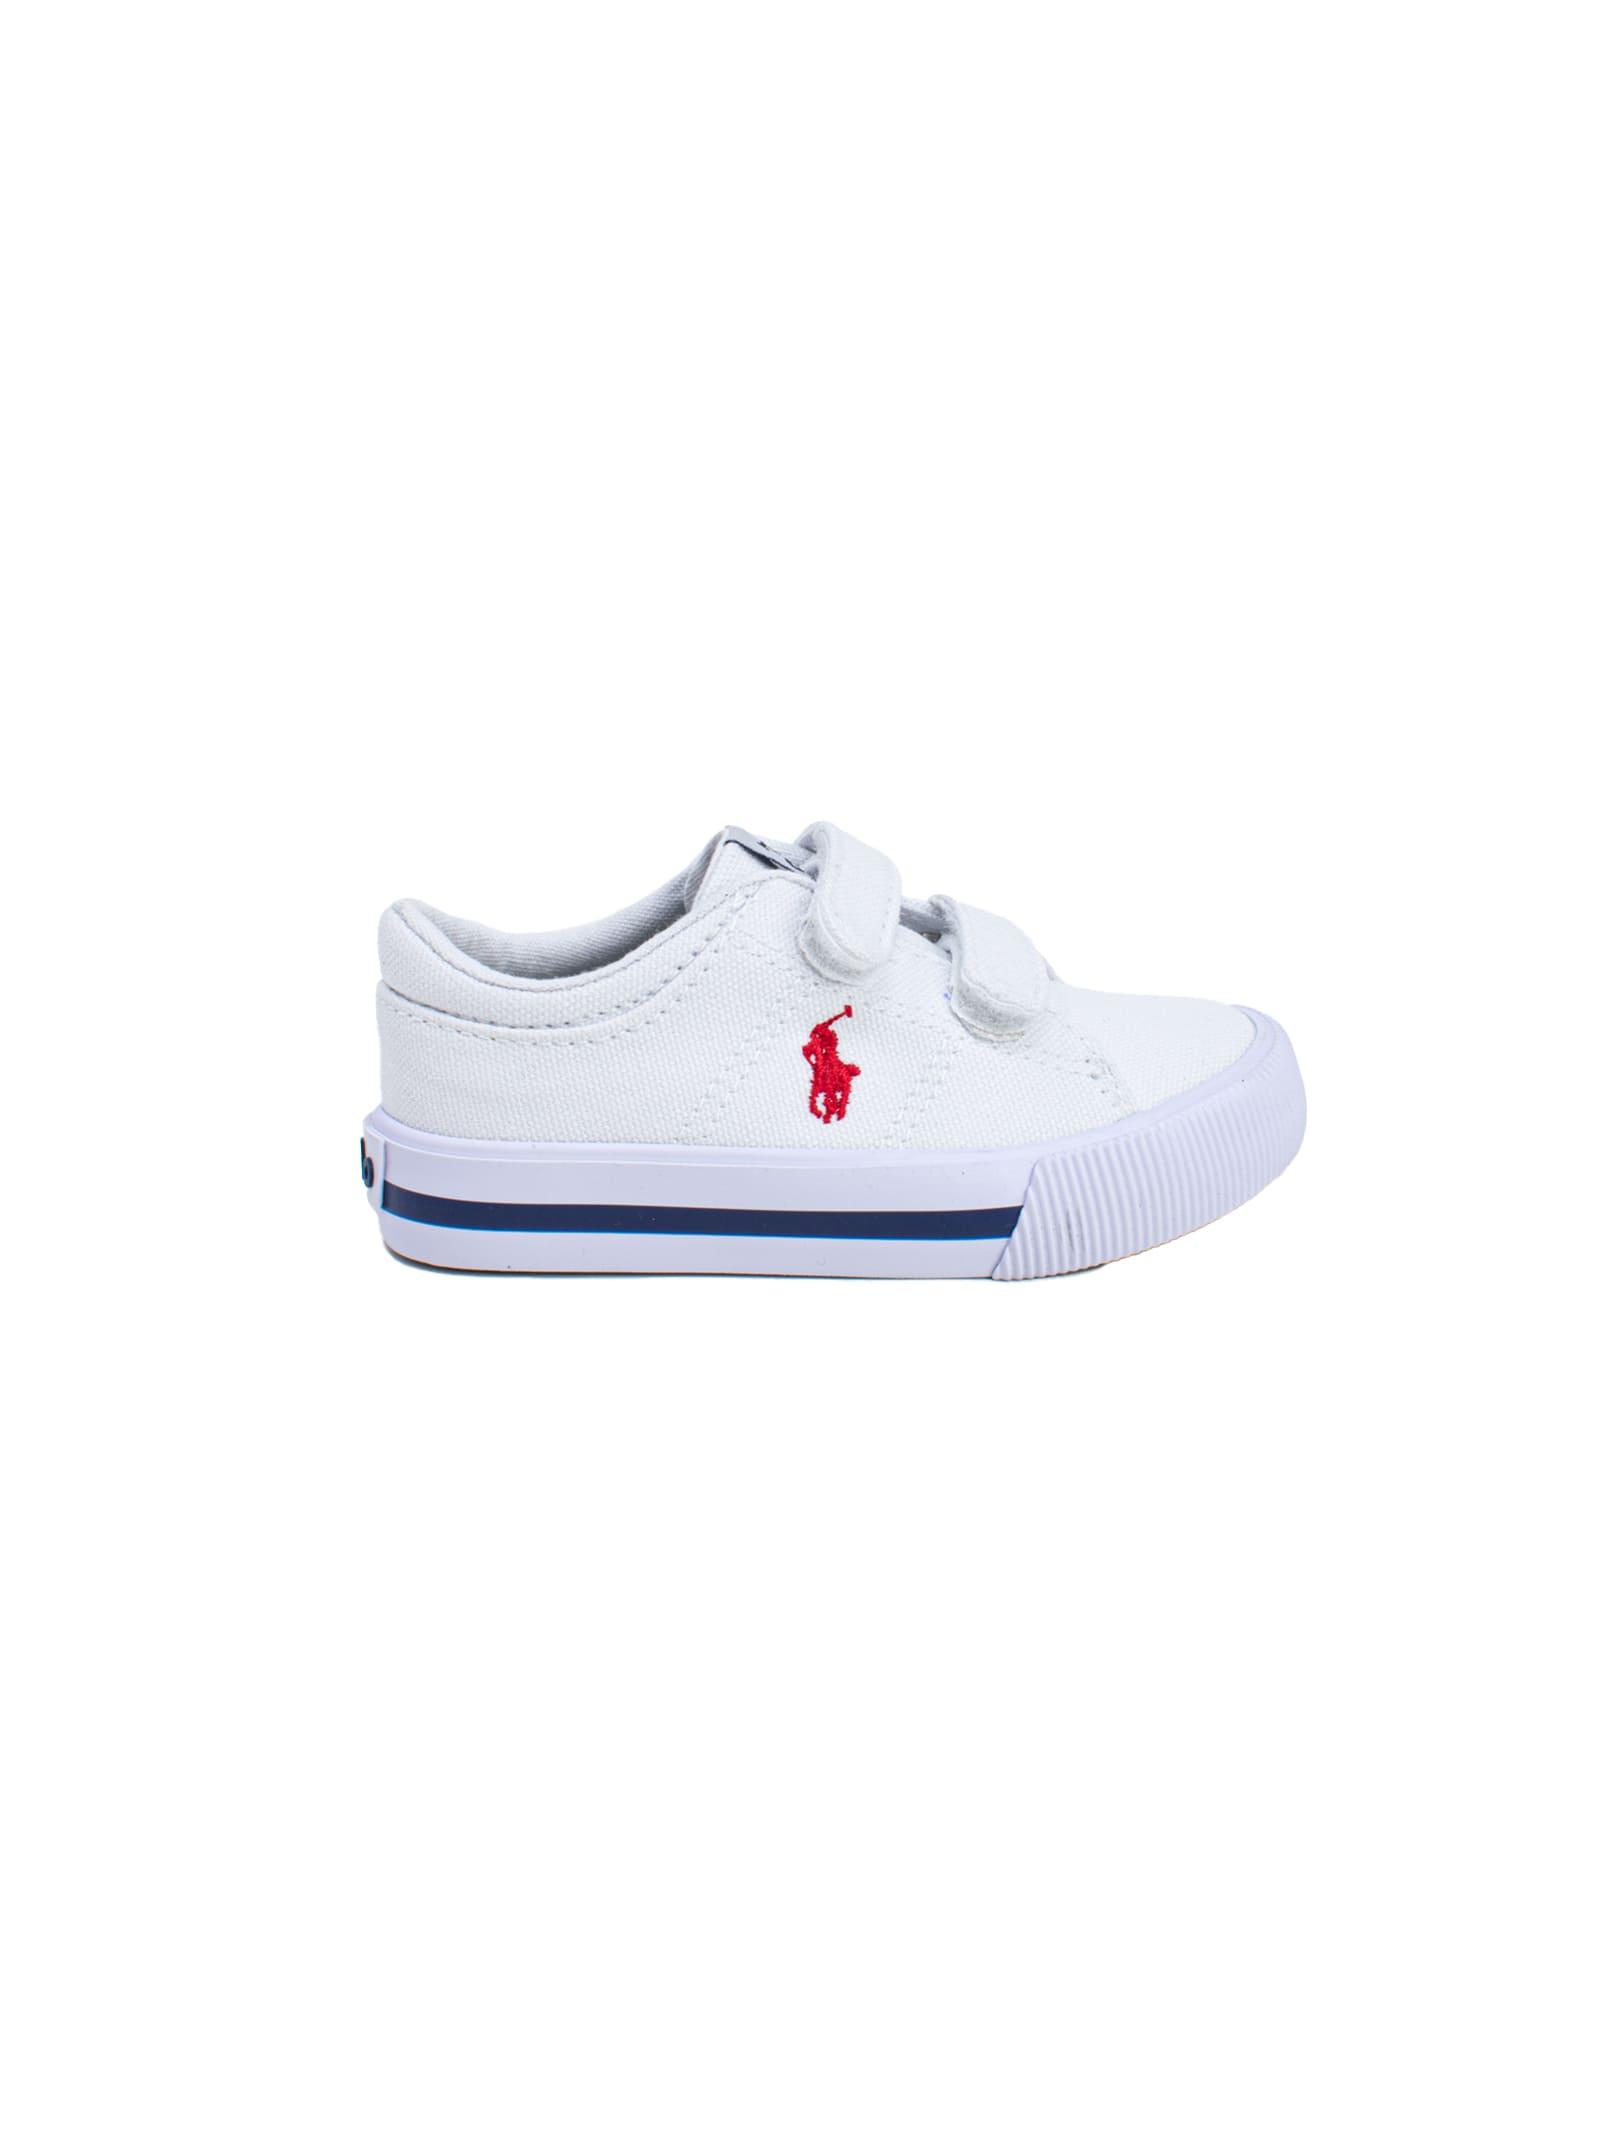 Sneaker Bambino Iconica Tela Bianca POLO RALPH LAUREN JUNIOR | Scarpe | 12RF102952WHITE